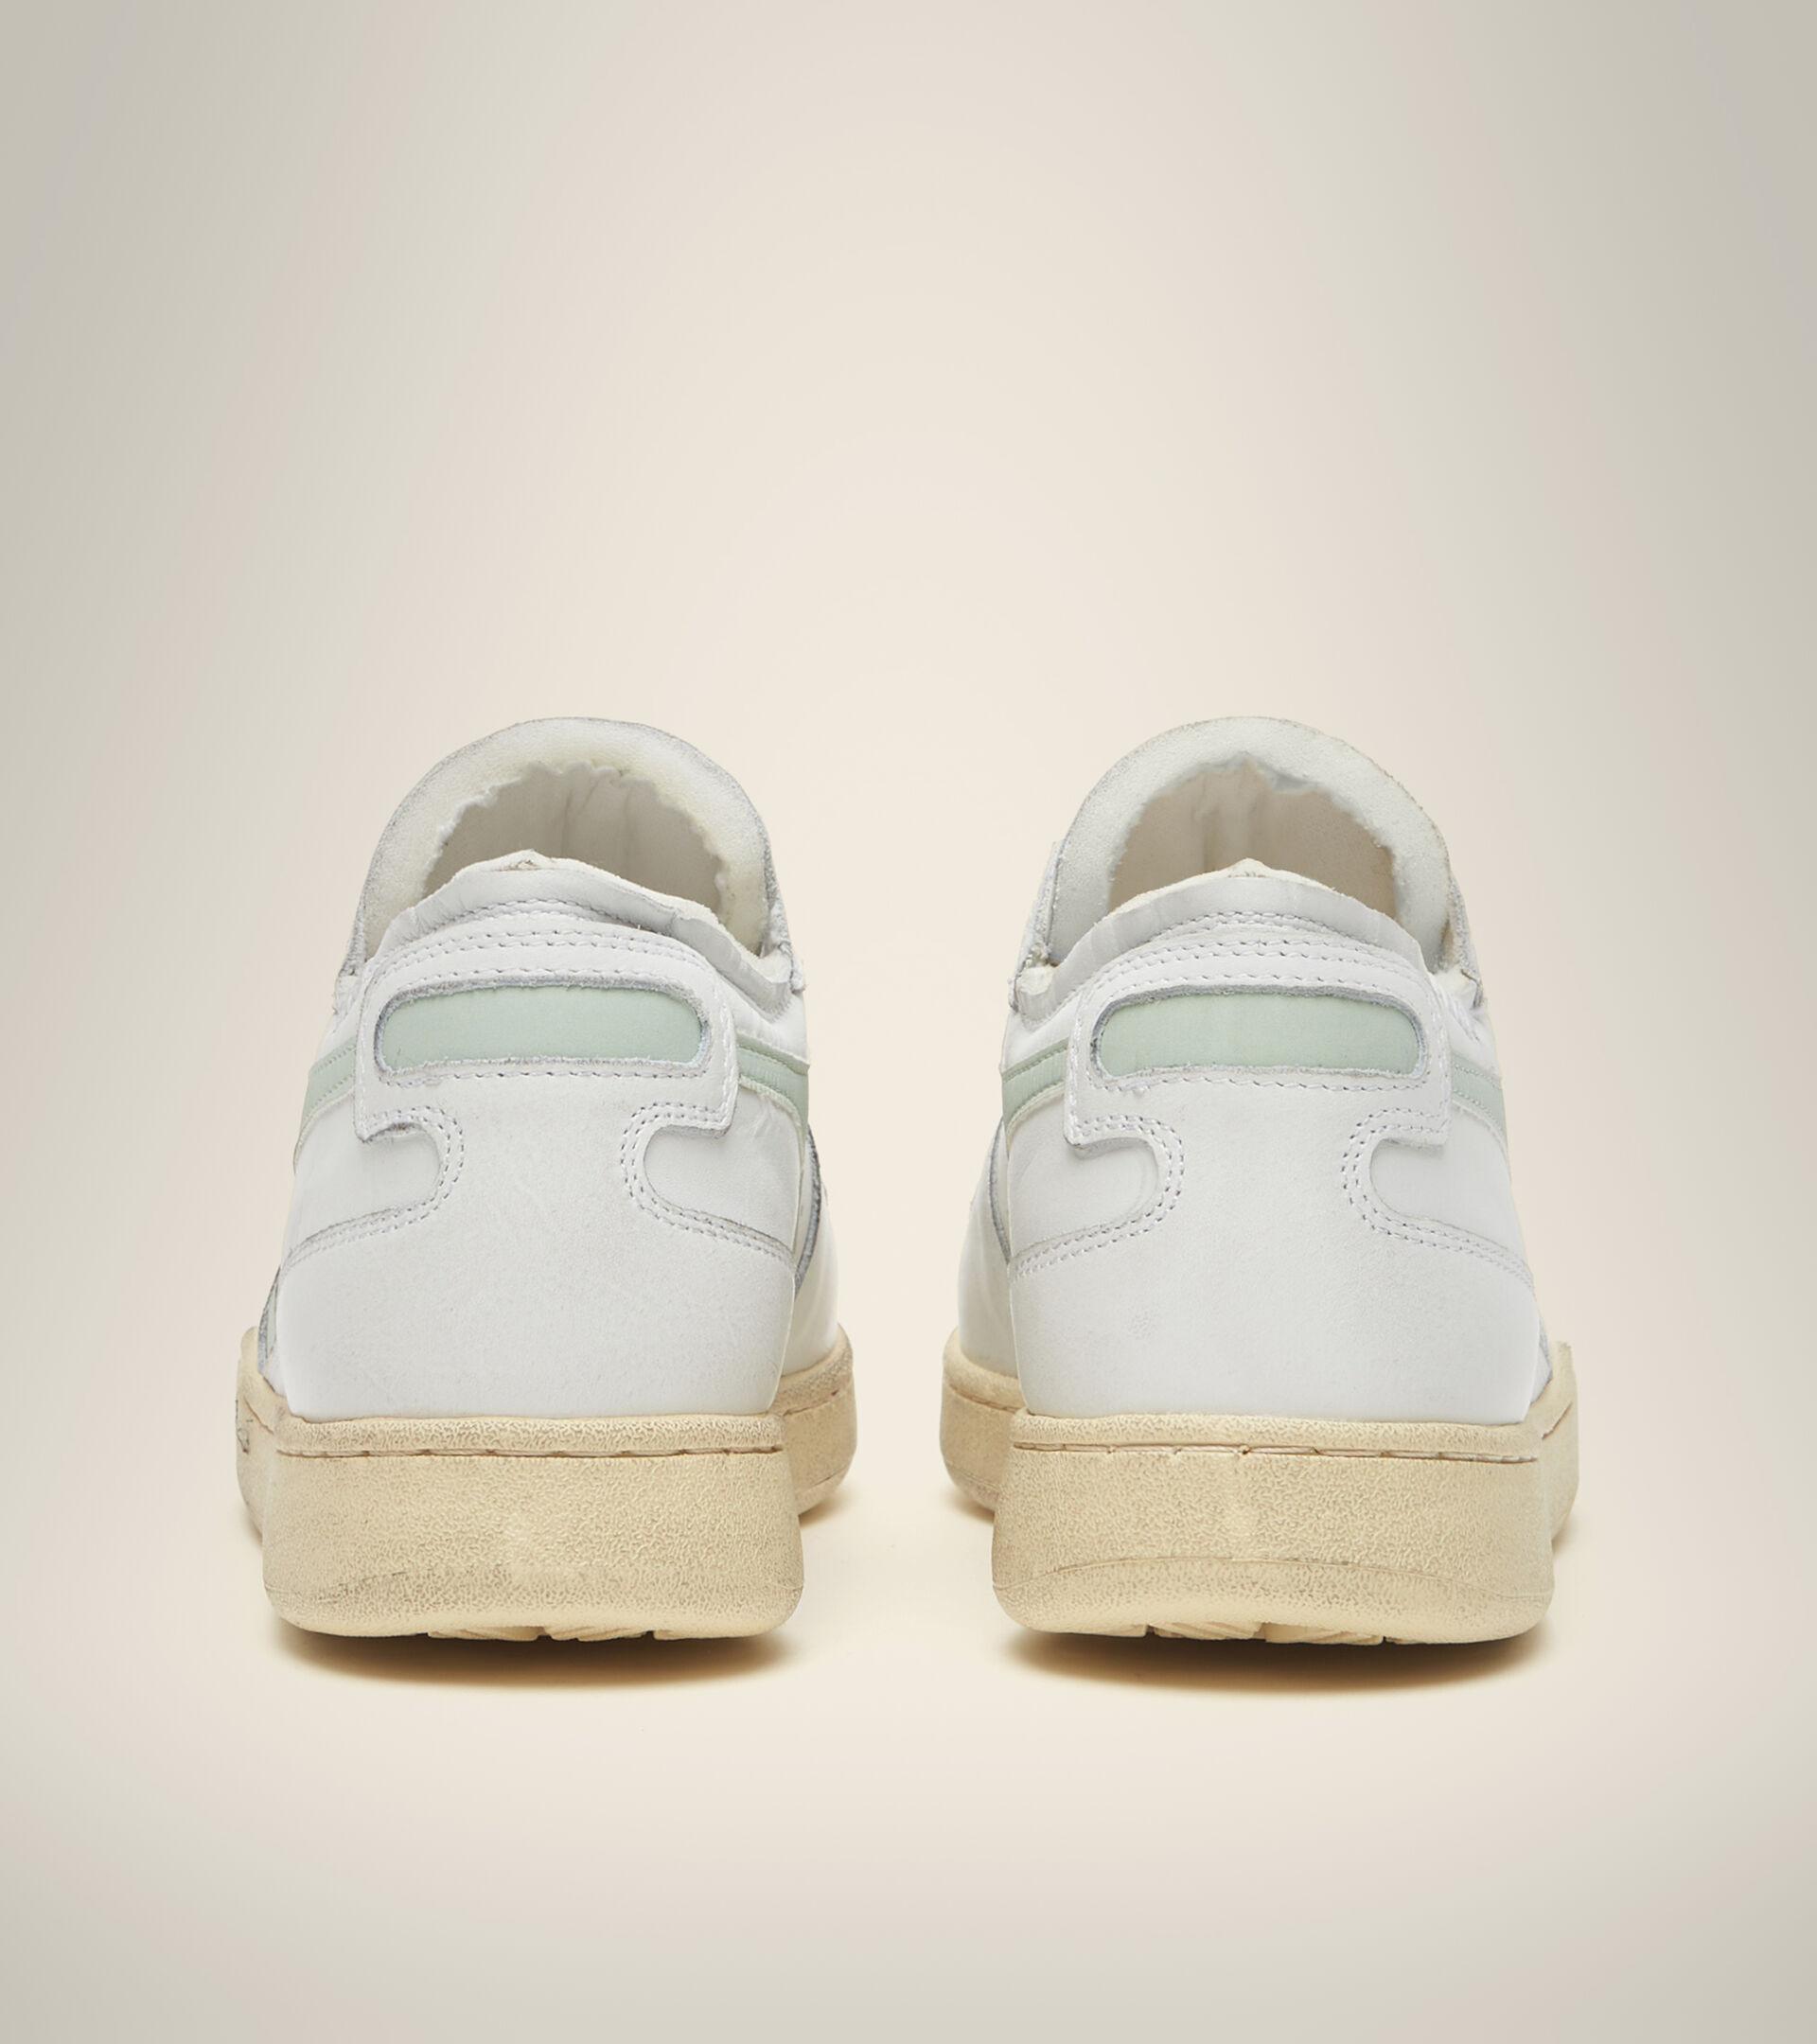 Chaussures Heritage - Unisexe MI BASKET ROW CUT BLANC/VERT FUMEE - Diadora